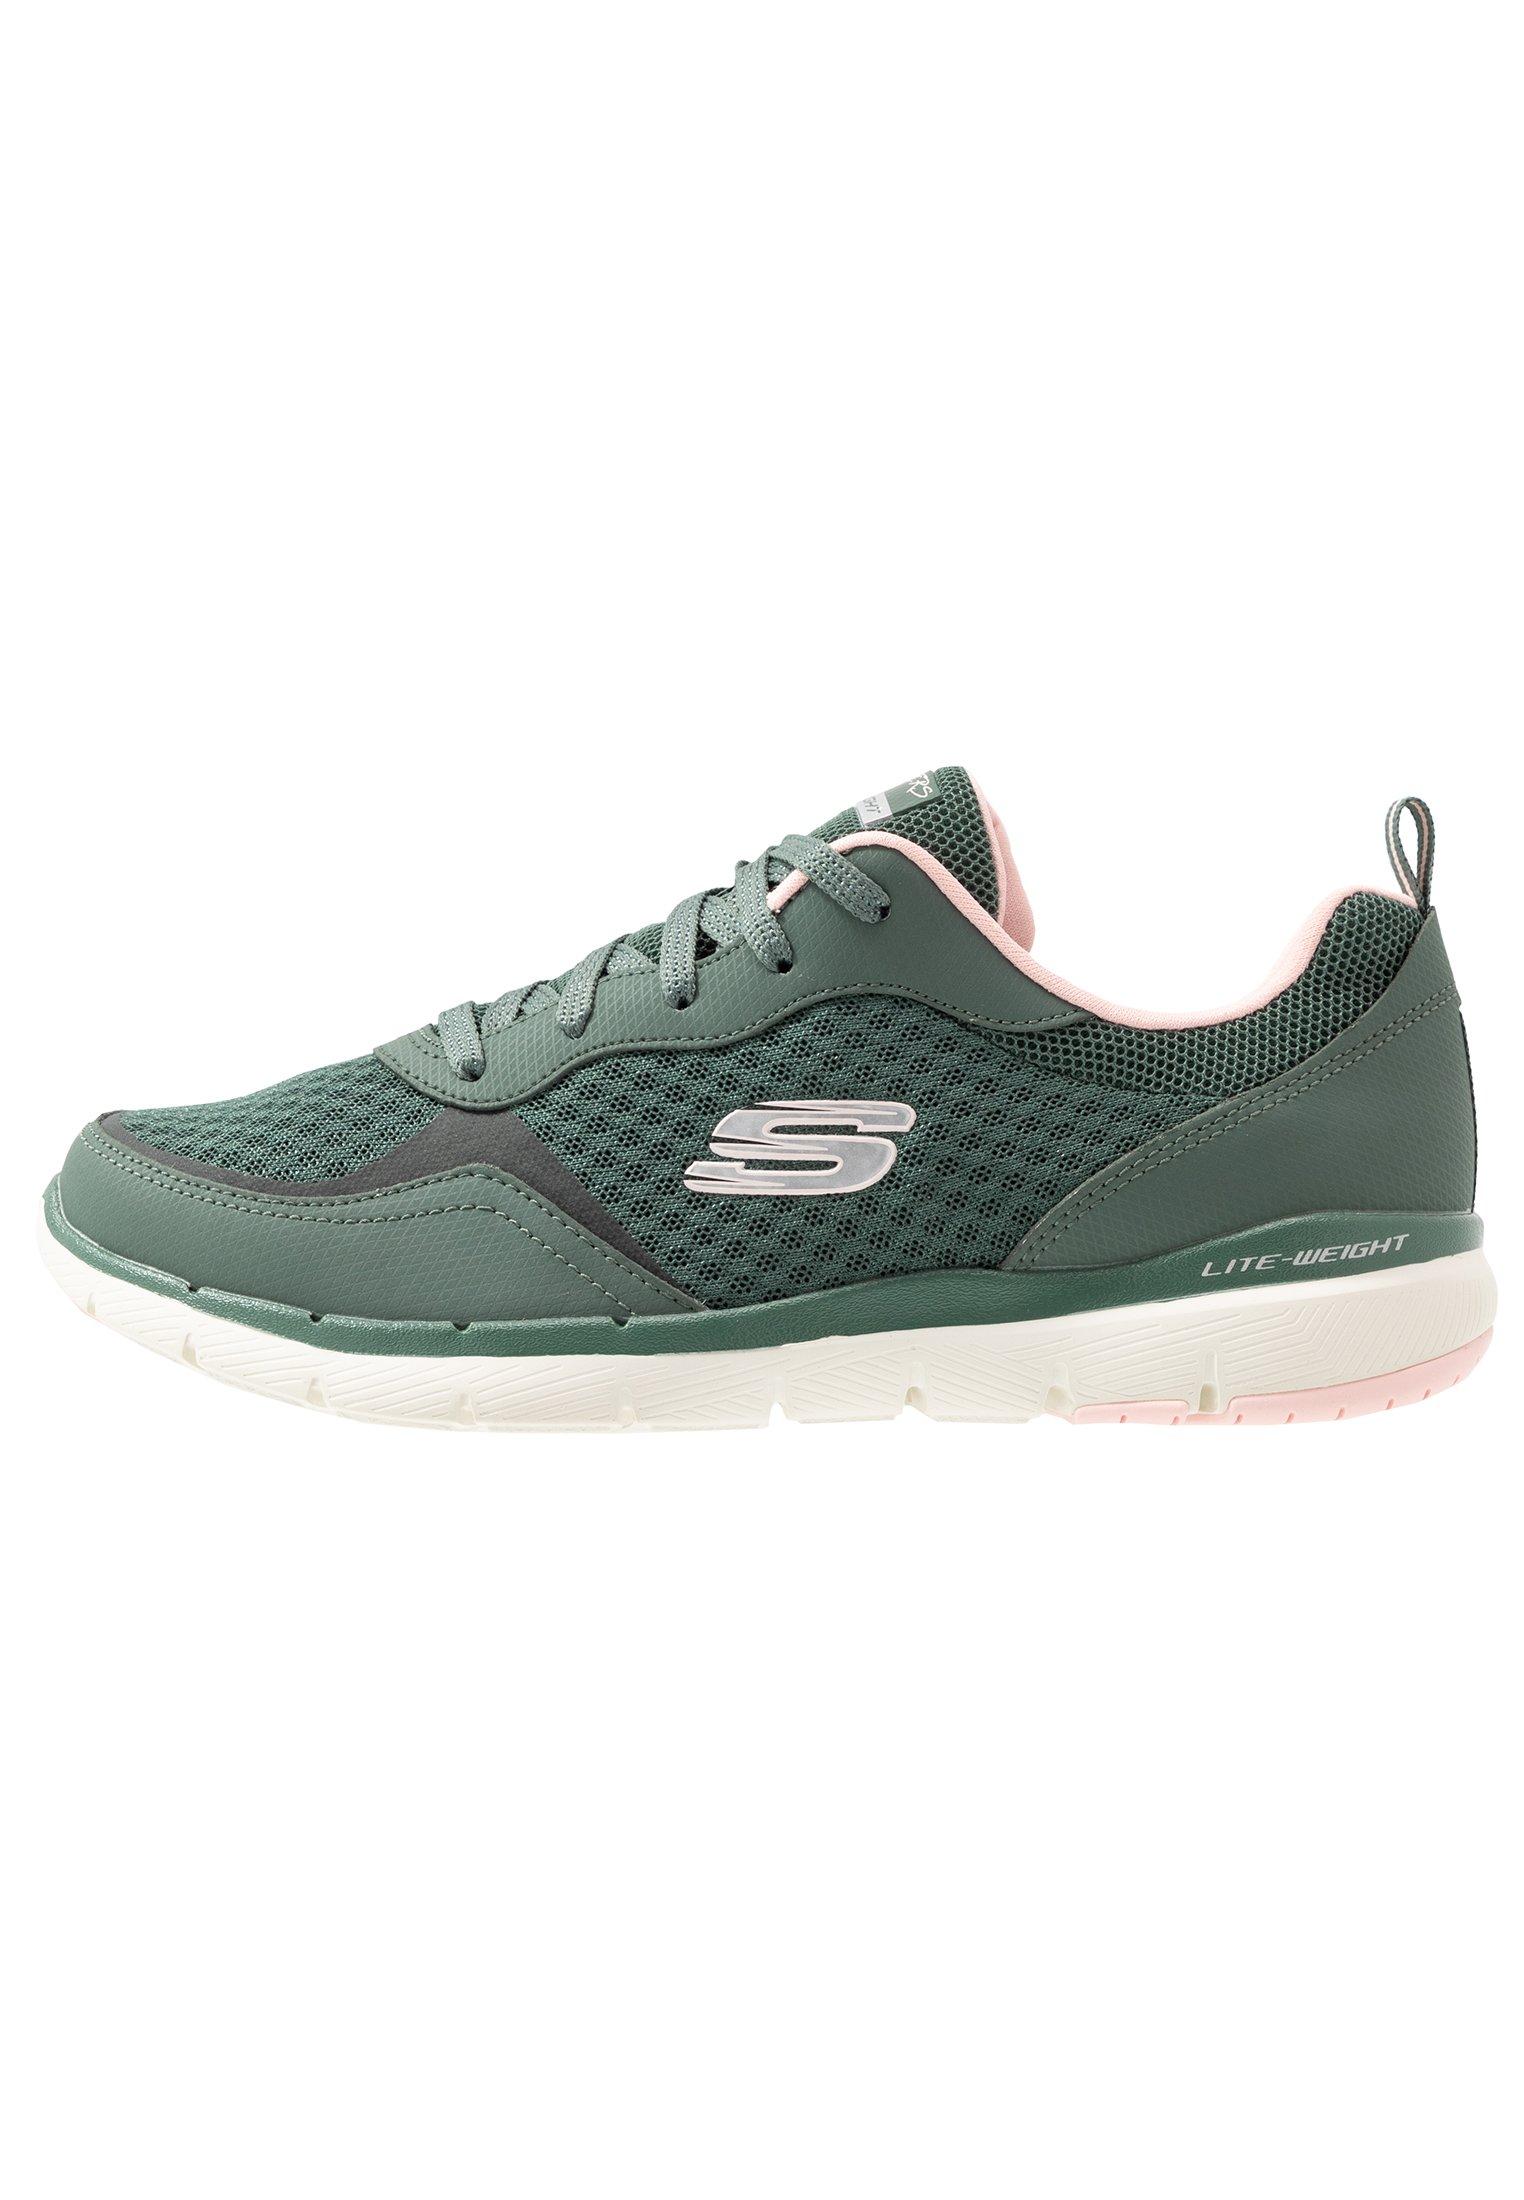 FLEX APPEAL Sneakers olivepink